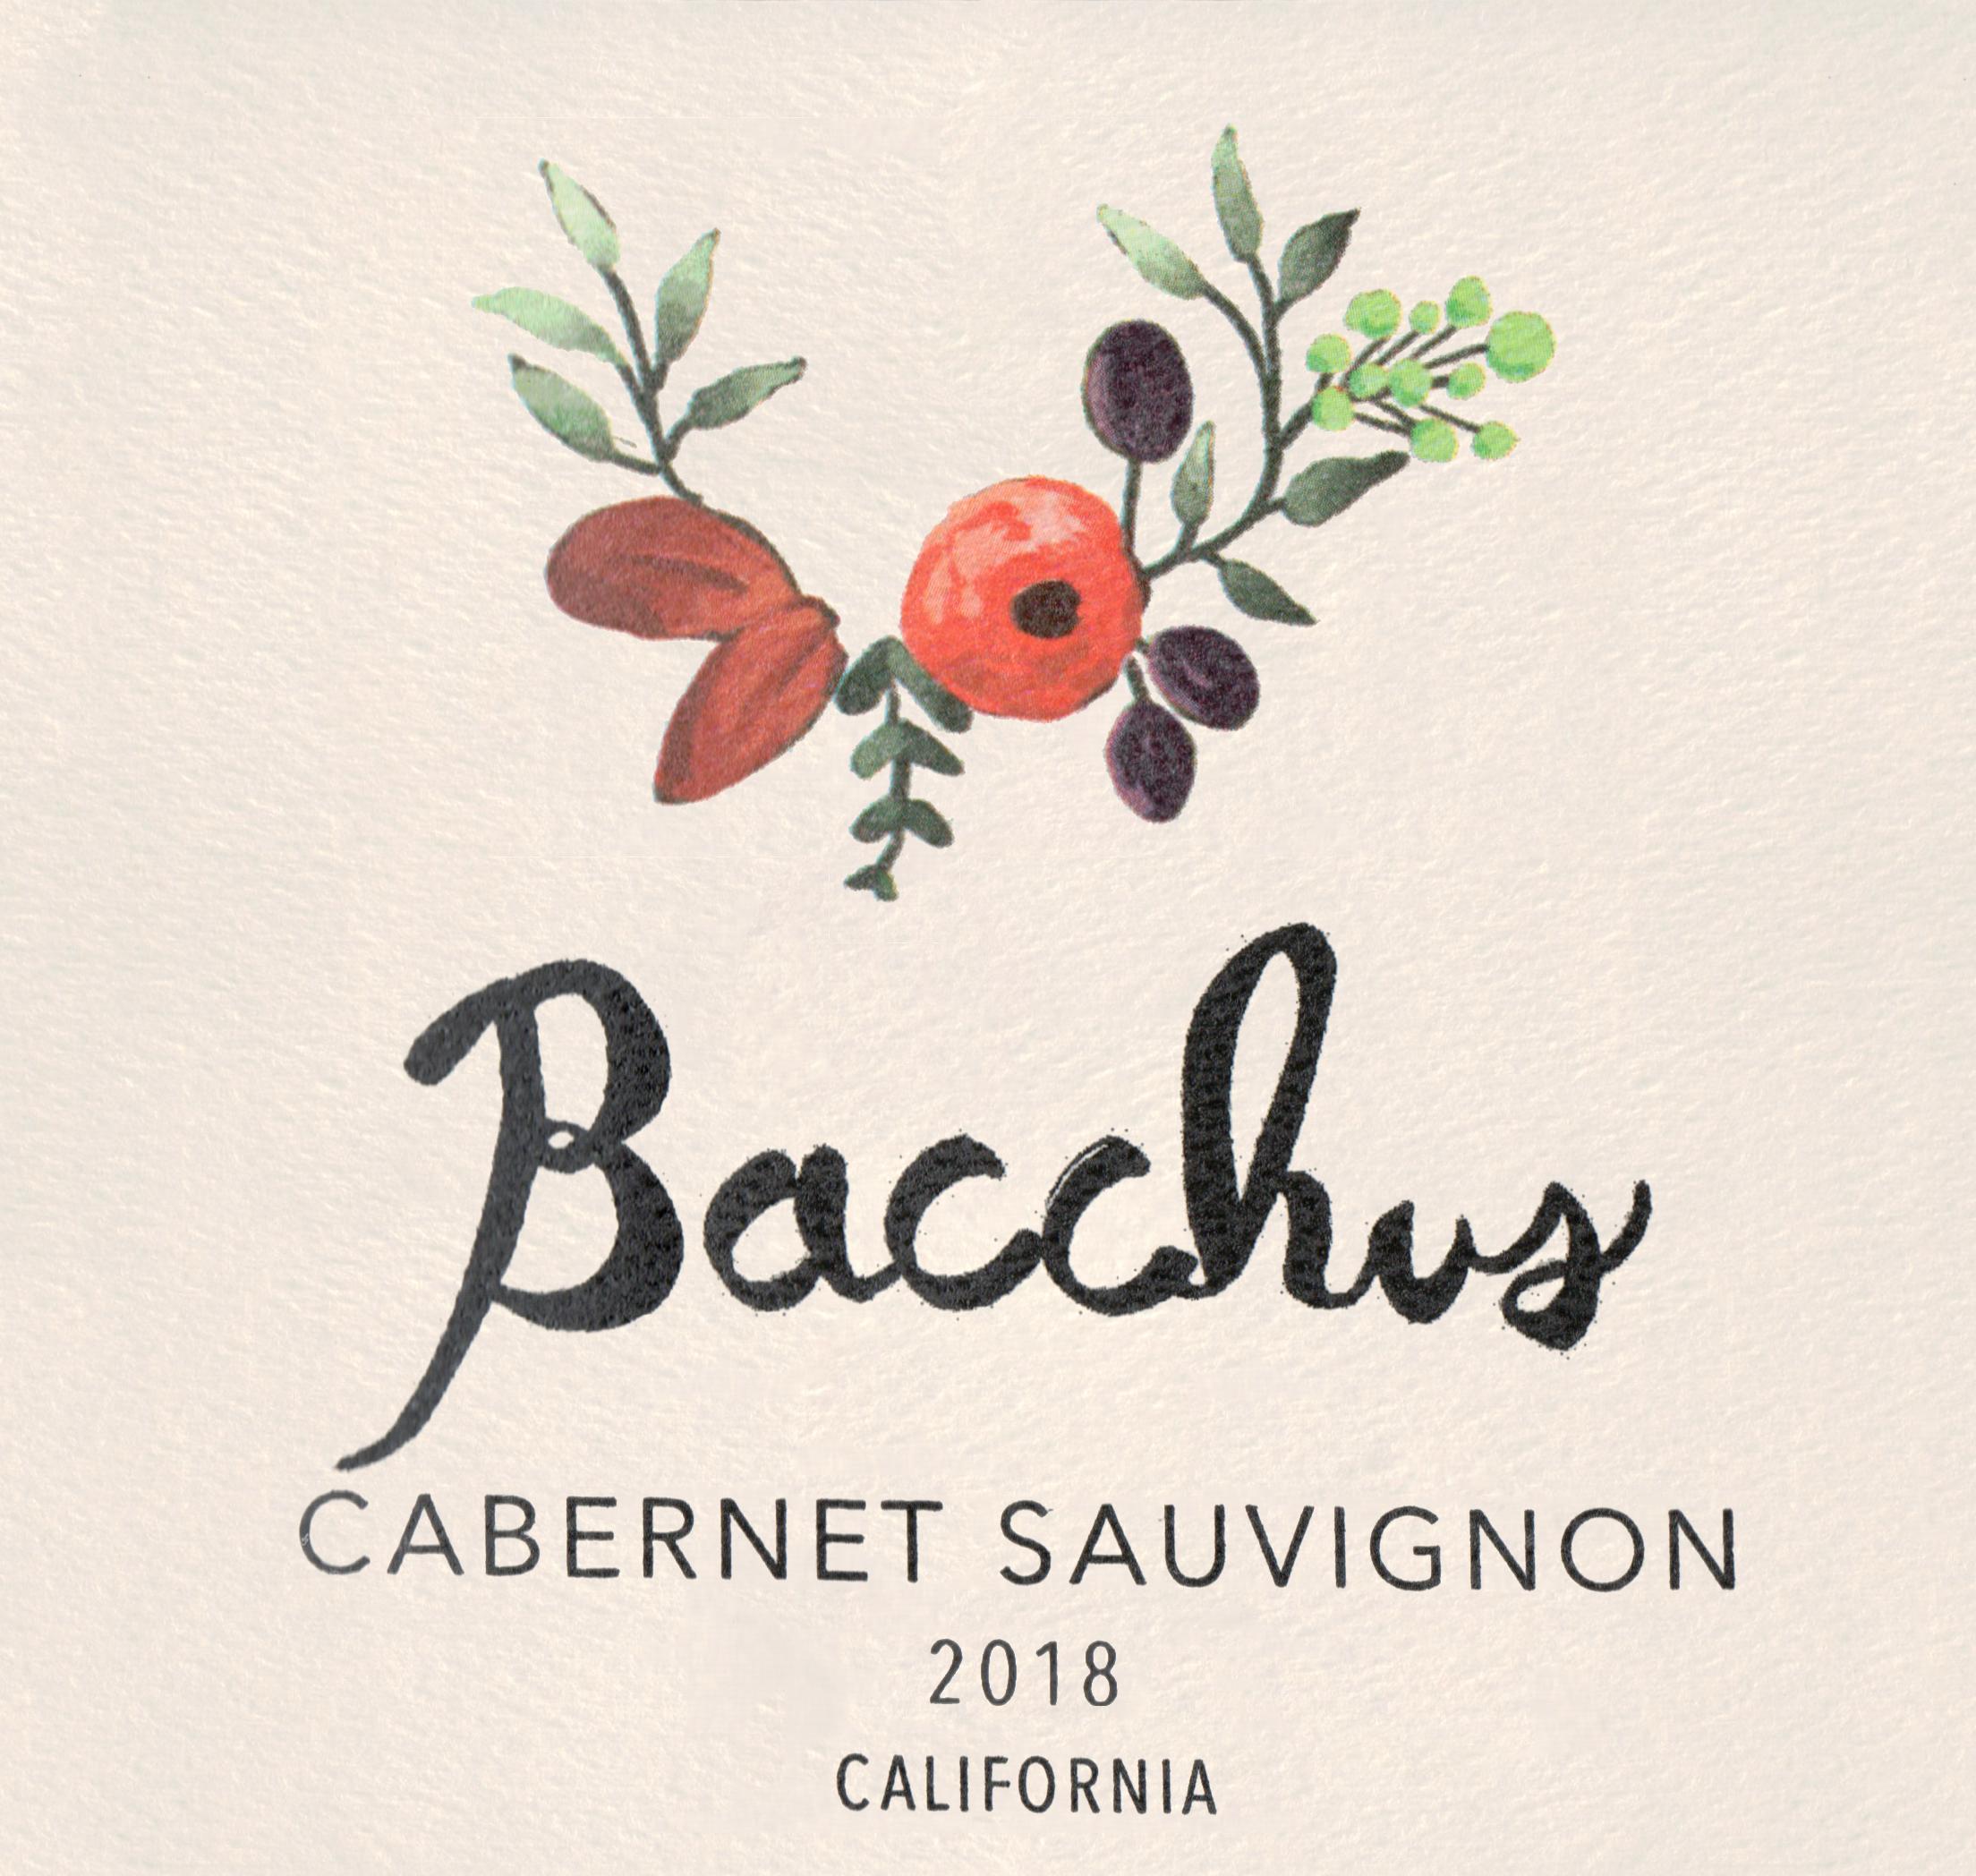 Bacchus Cabernet Sauvignon 2018